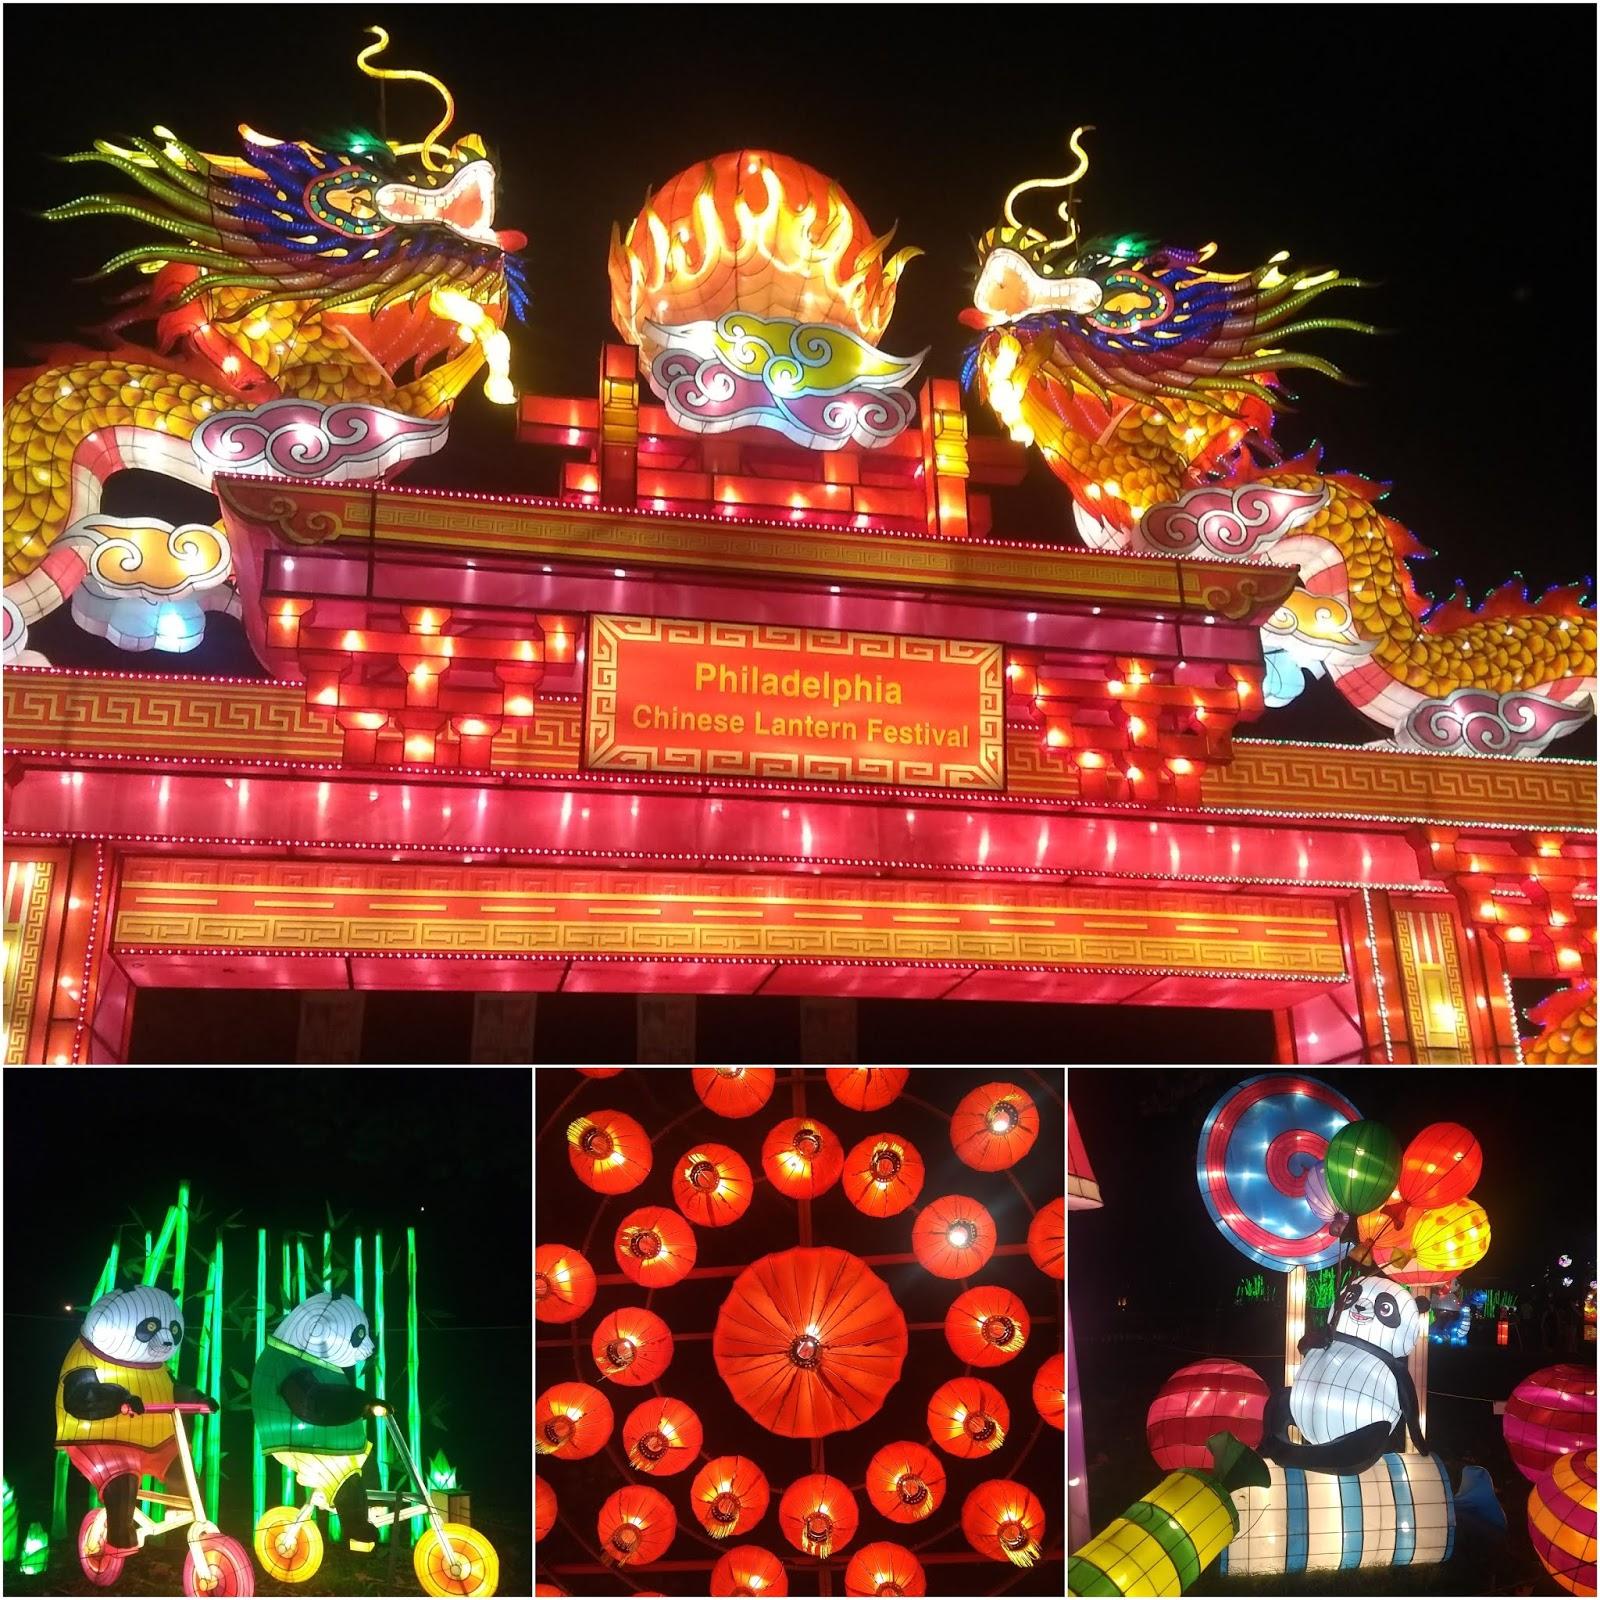 Chinese Lantern Festival Philadelphia 2020.2019 Chinese Lantern Festival Nikki Snailfiles